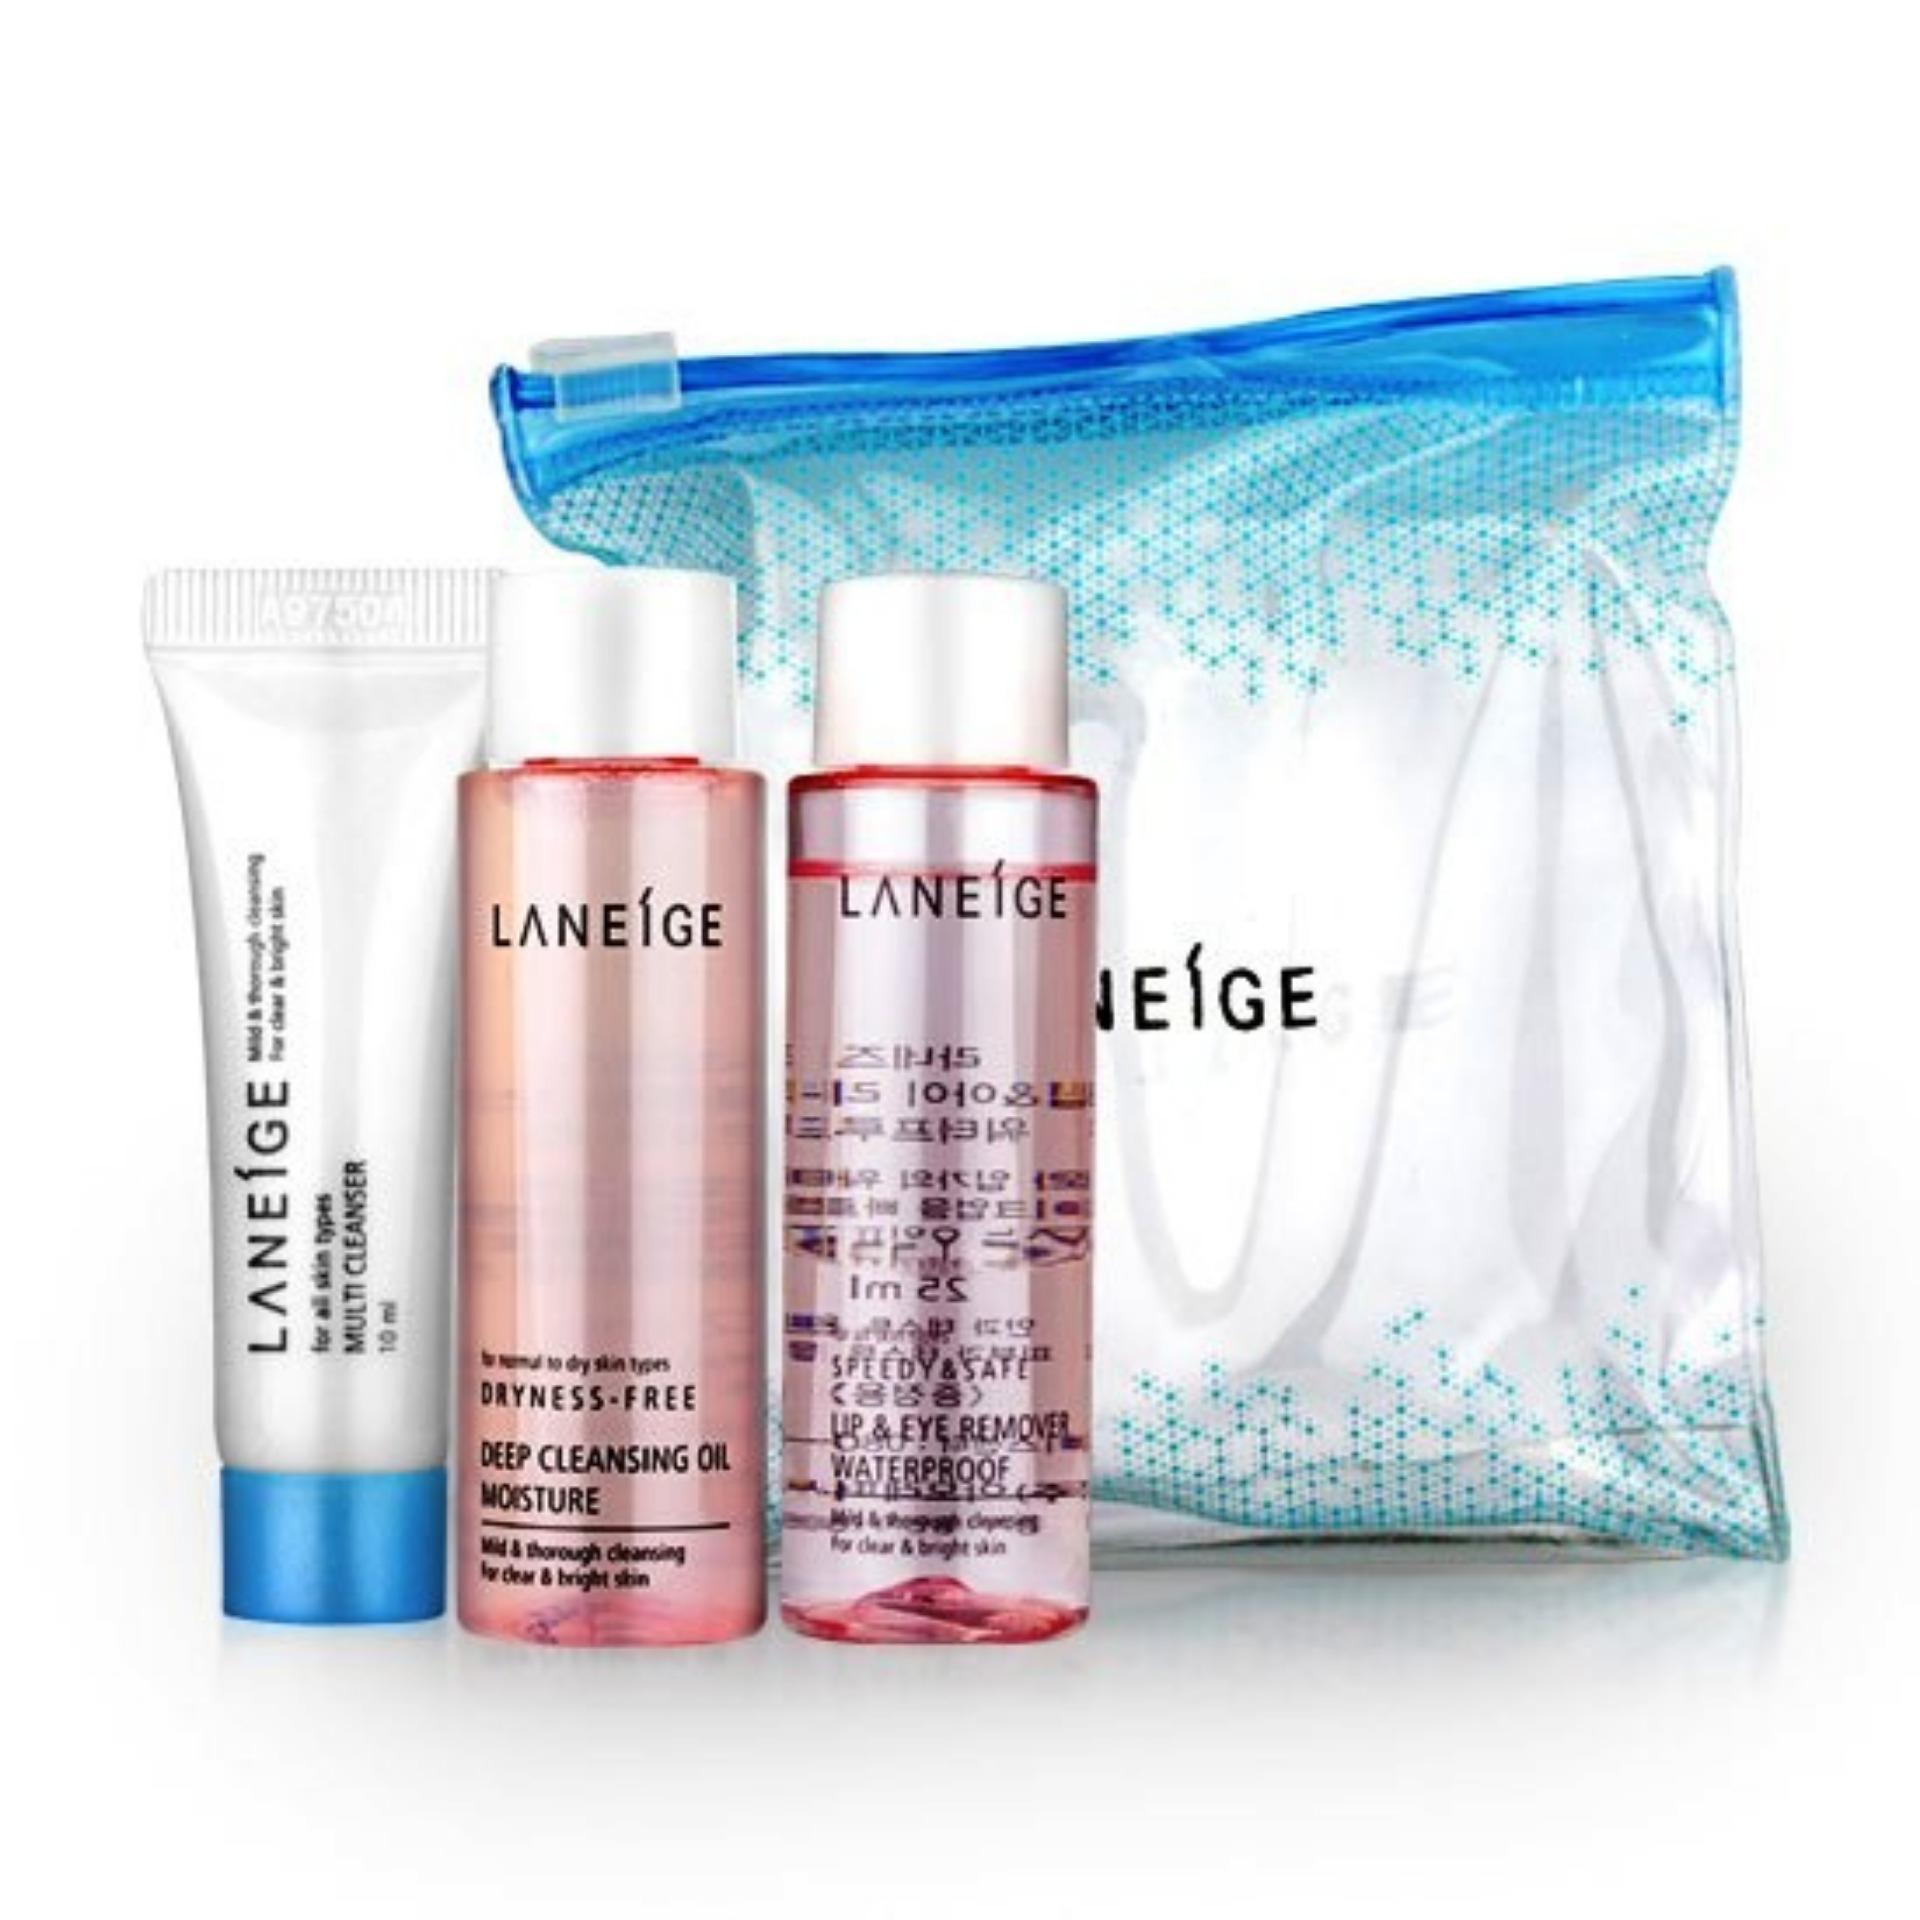 Philippines Korean Cosmetics Laneige New Cleansing Trial Kit 3 Lip Eye Make Up Remover Waterproof Ex 25ml Items